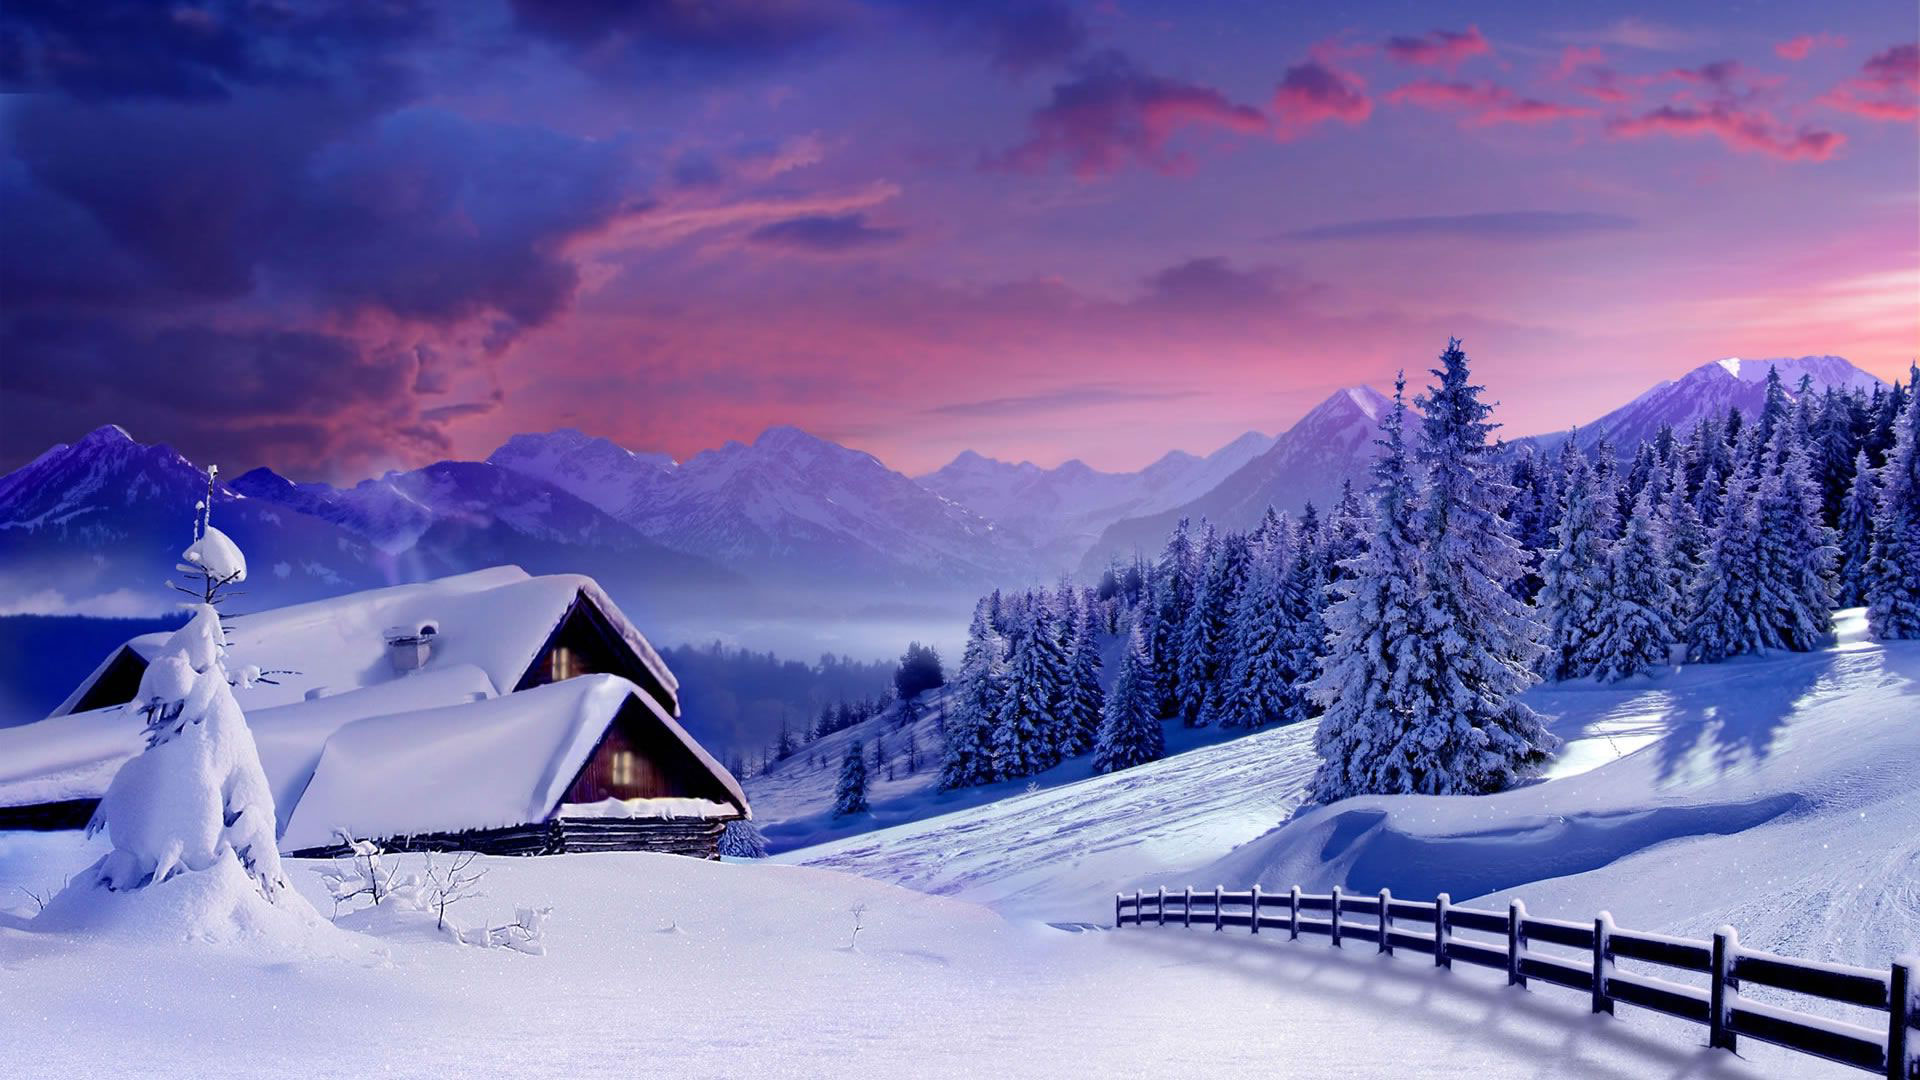 фотографии про снег окна входили